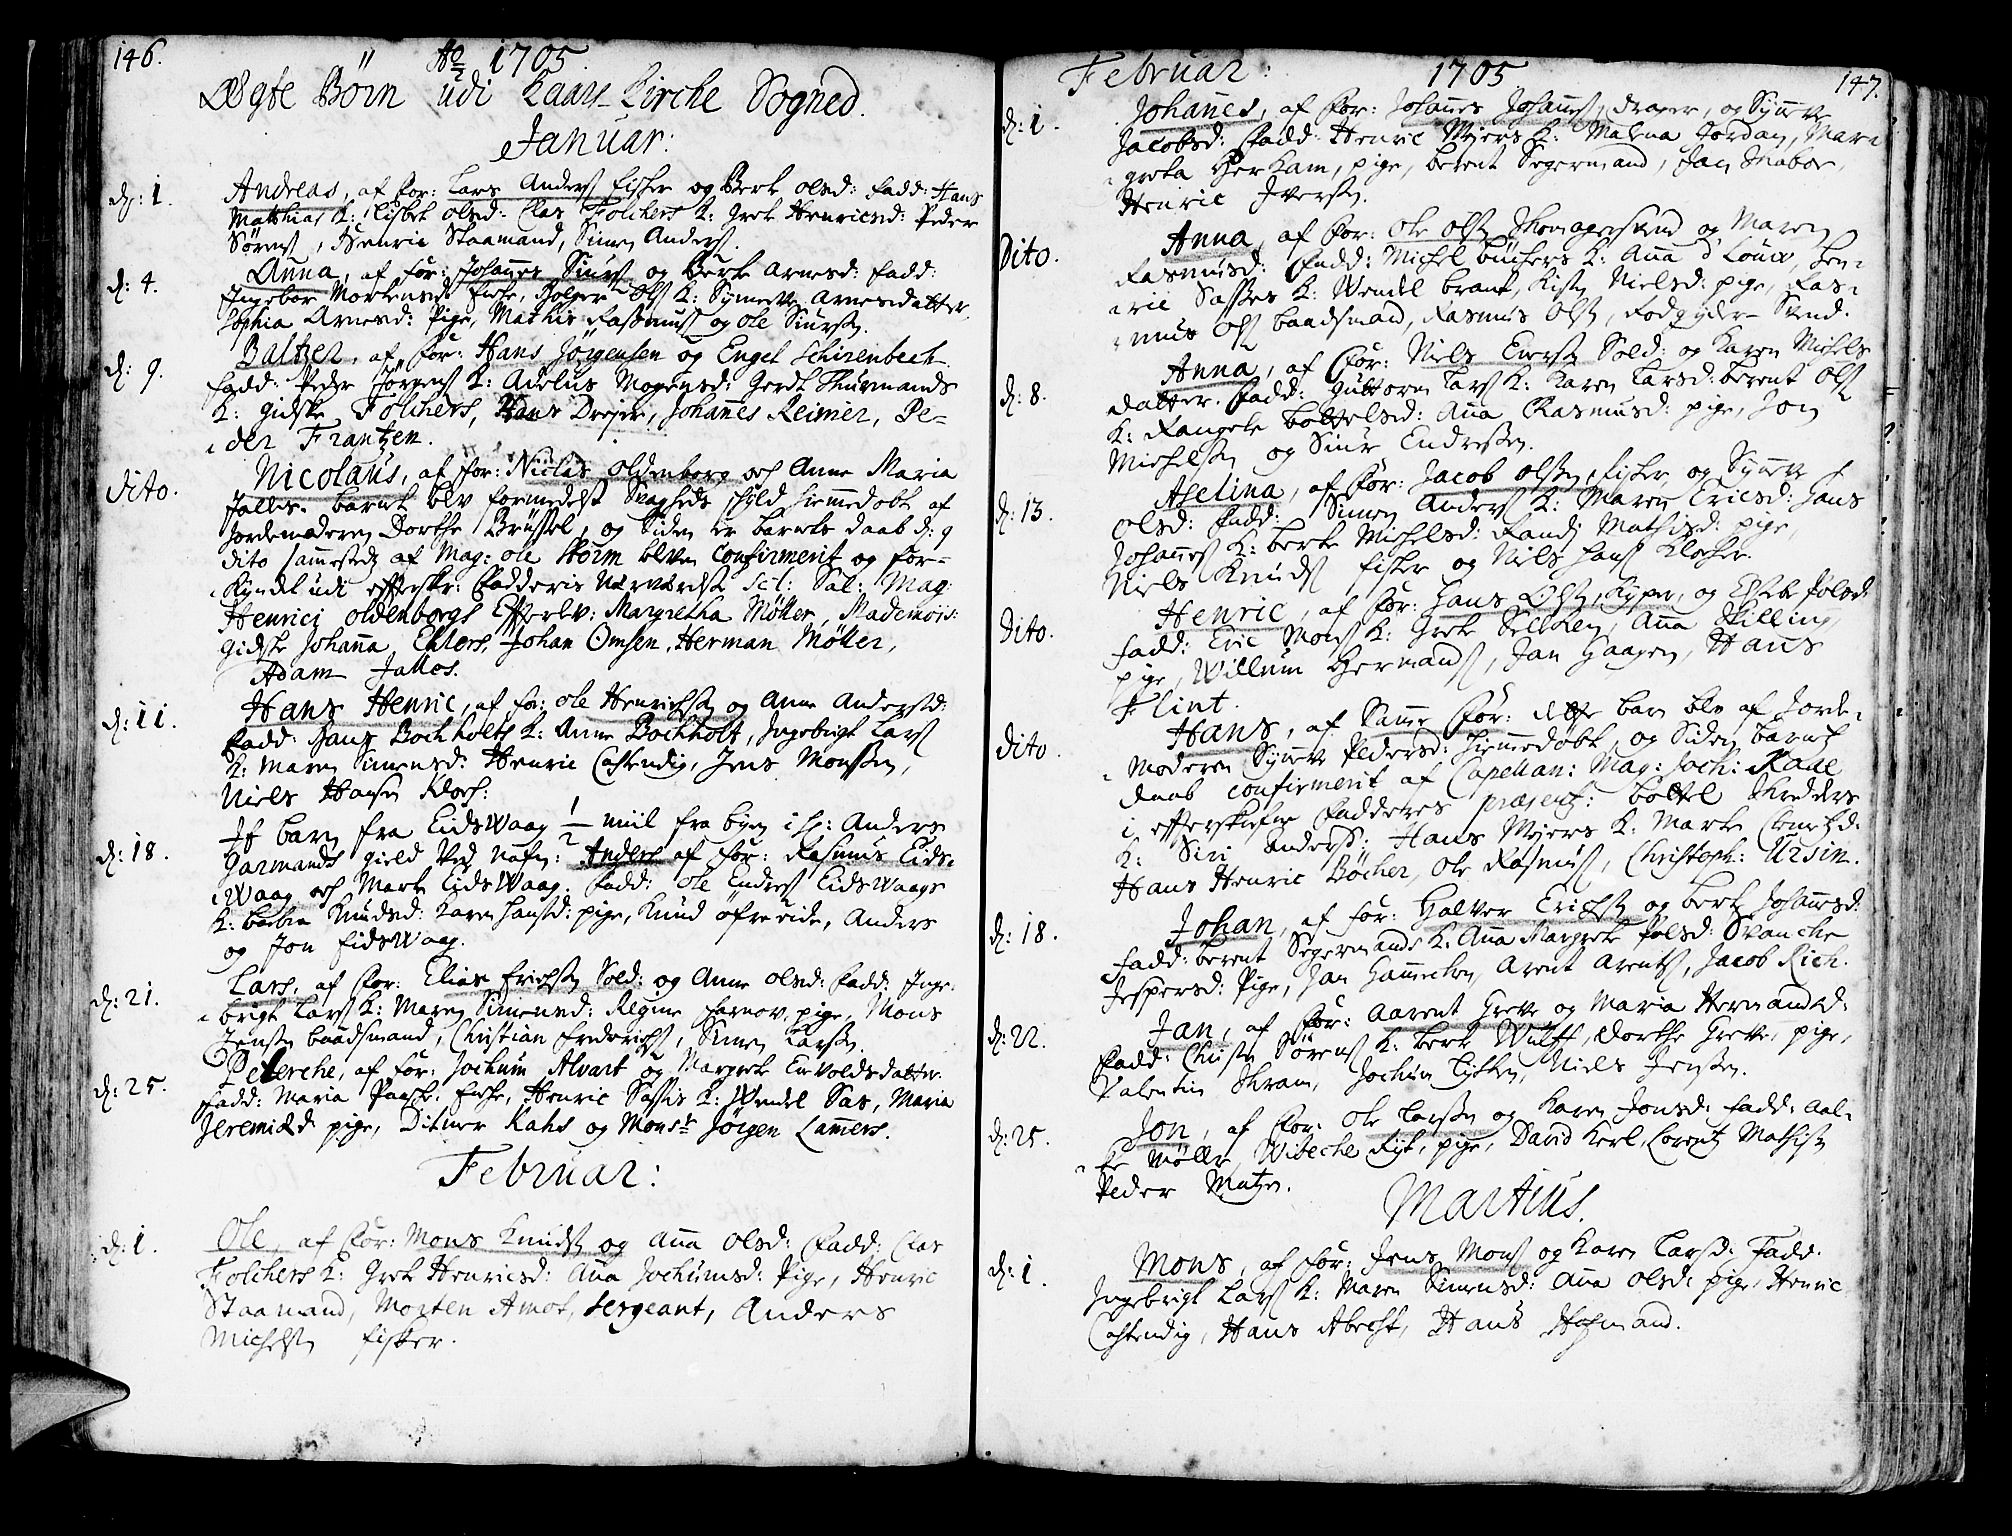 SAB, Korskirken Sokneprestembete, H/Haa/L0003: Ministerialbok nr. A 3, 1698-1719, s. 146-147